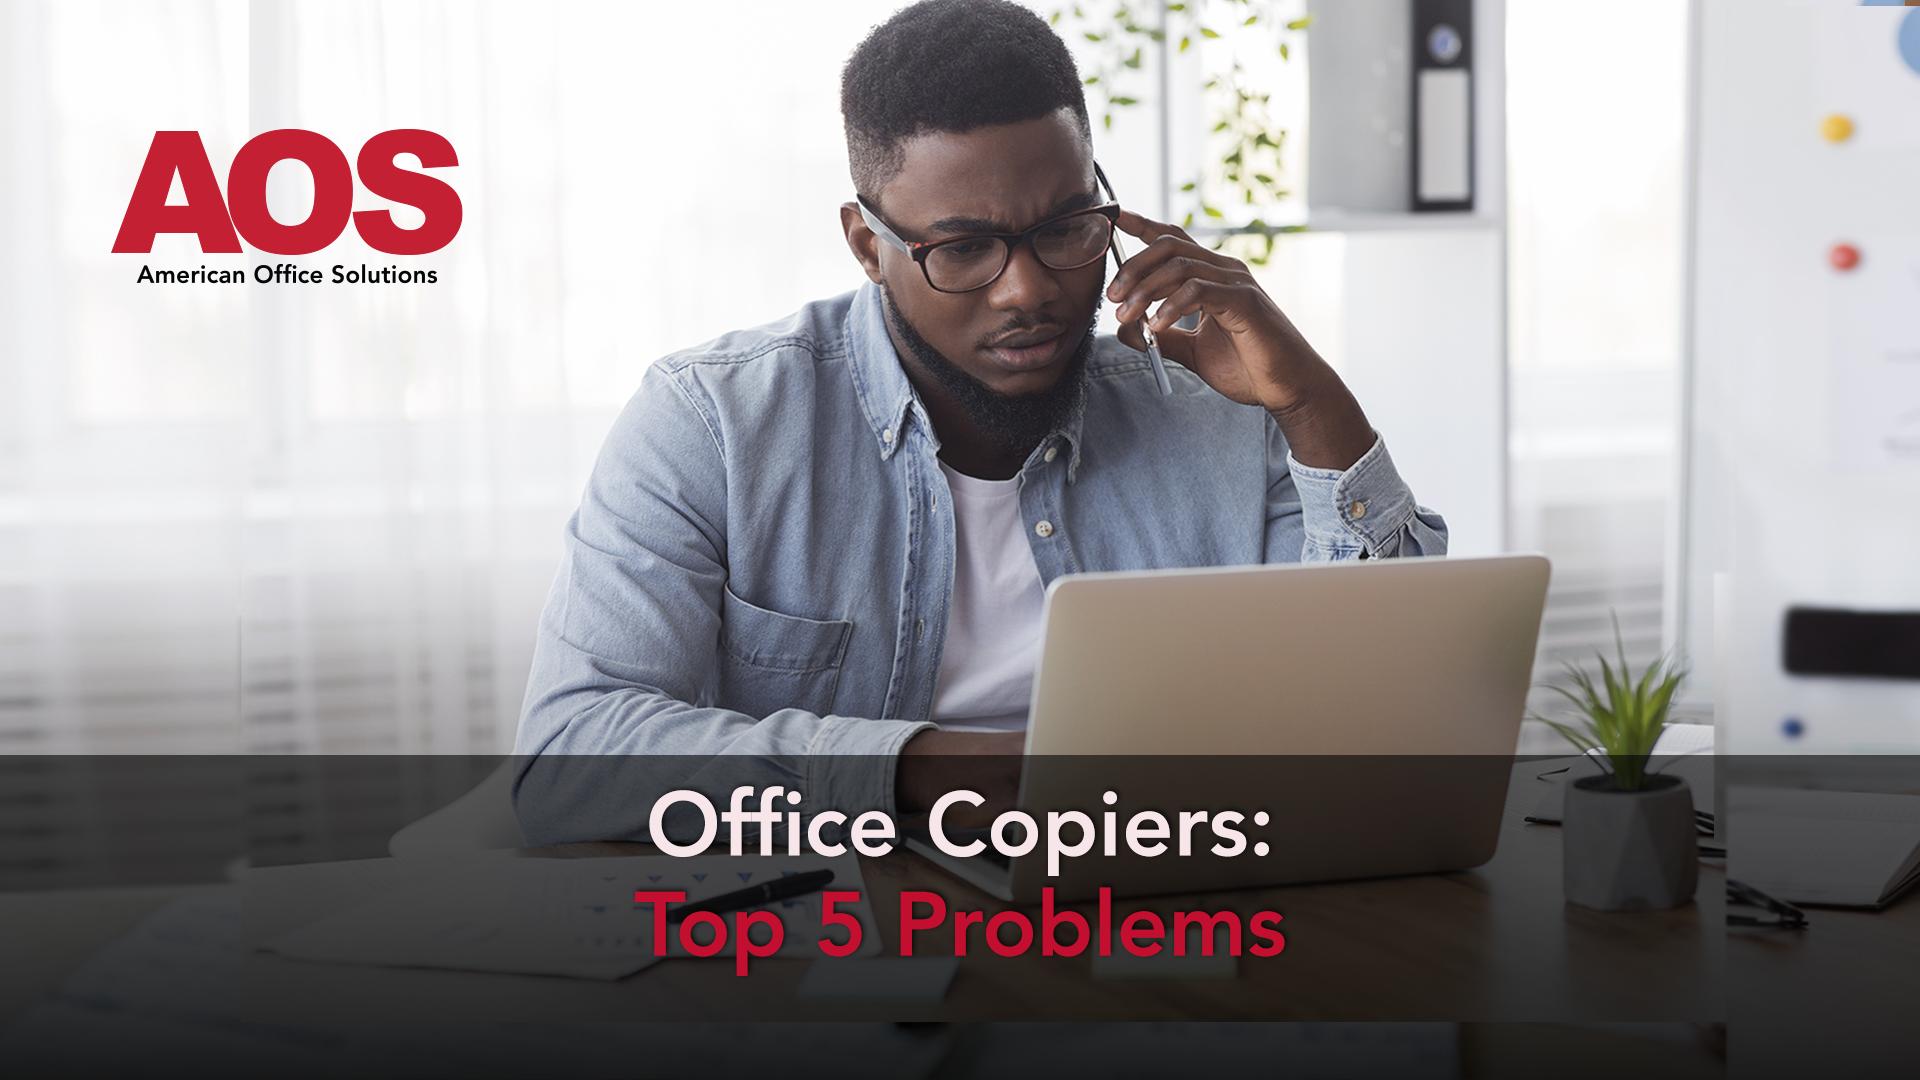 Office Copiers: Top 5 Problems